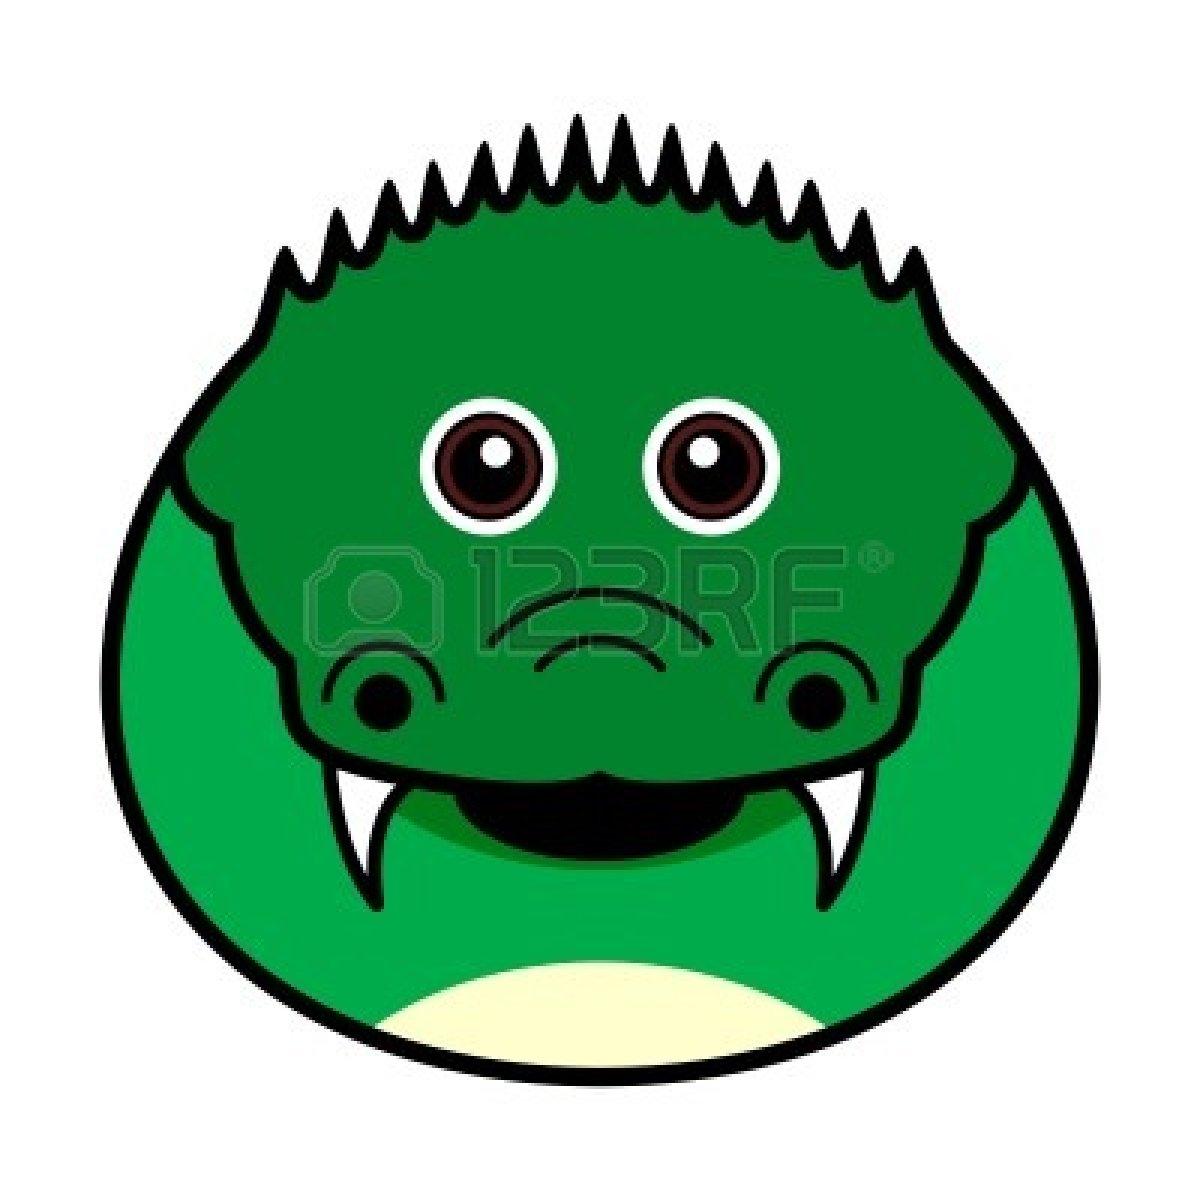 1200x1200 Jaw Alligator Clipart, Explore Pictures